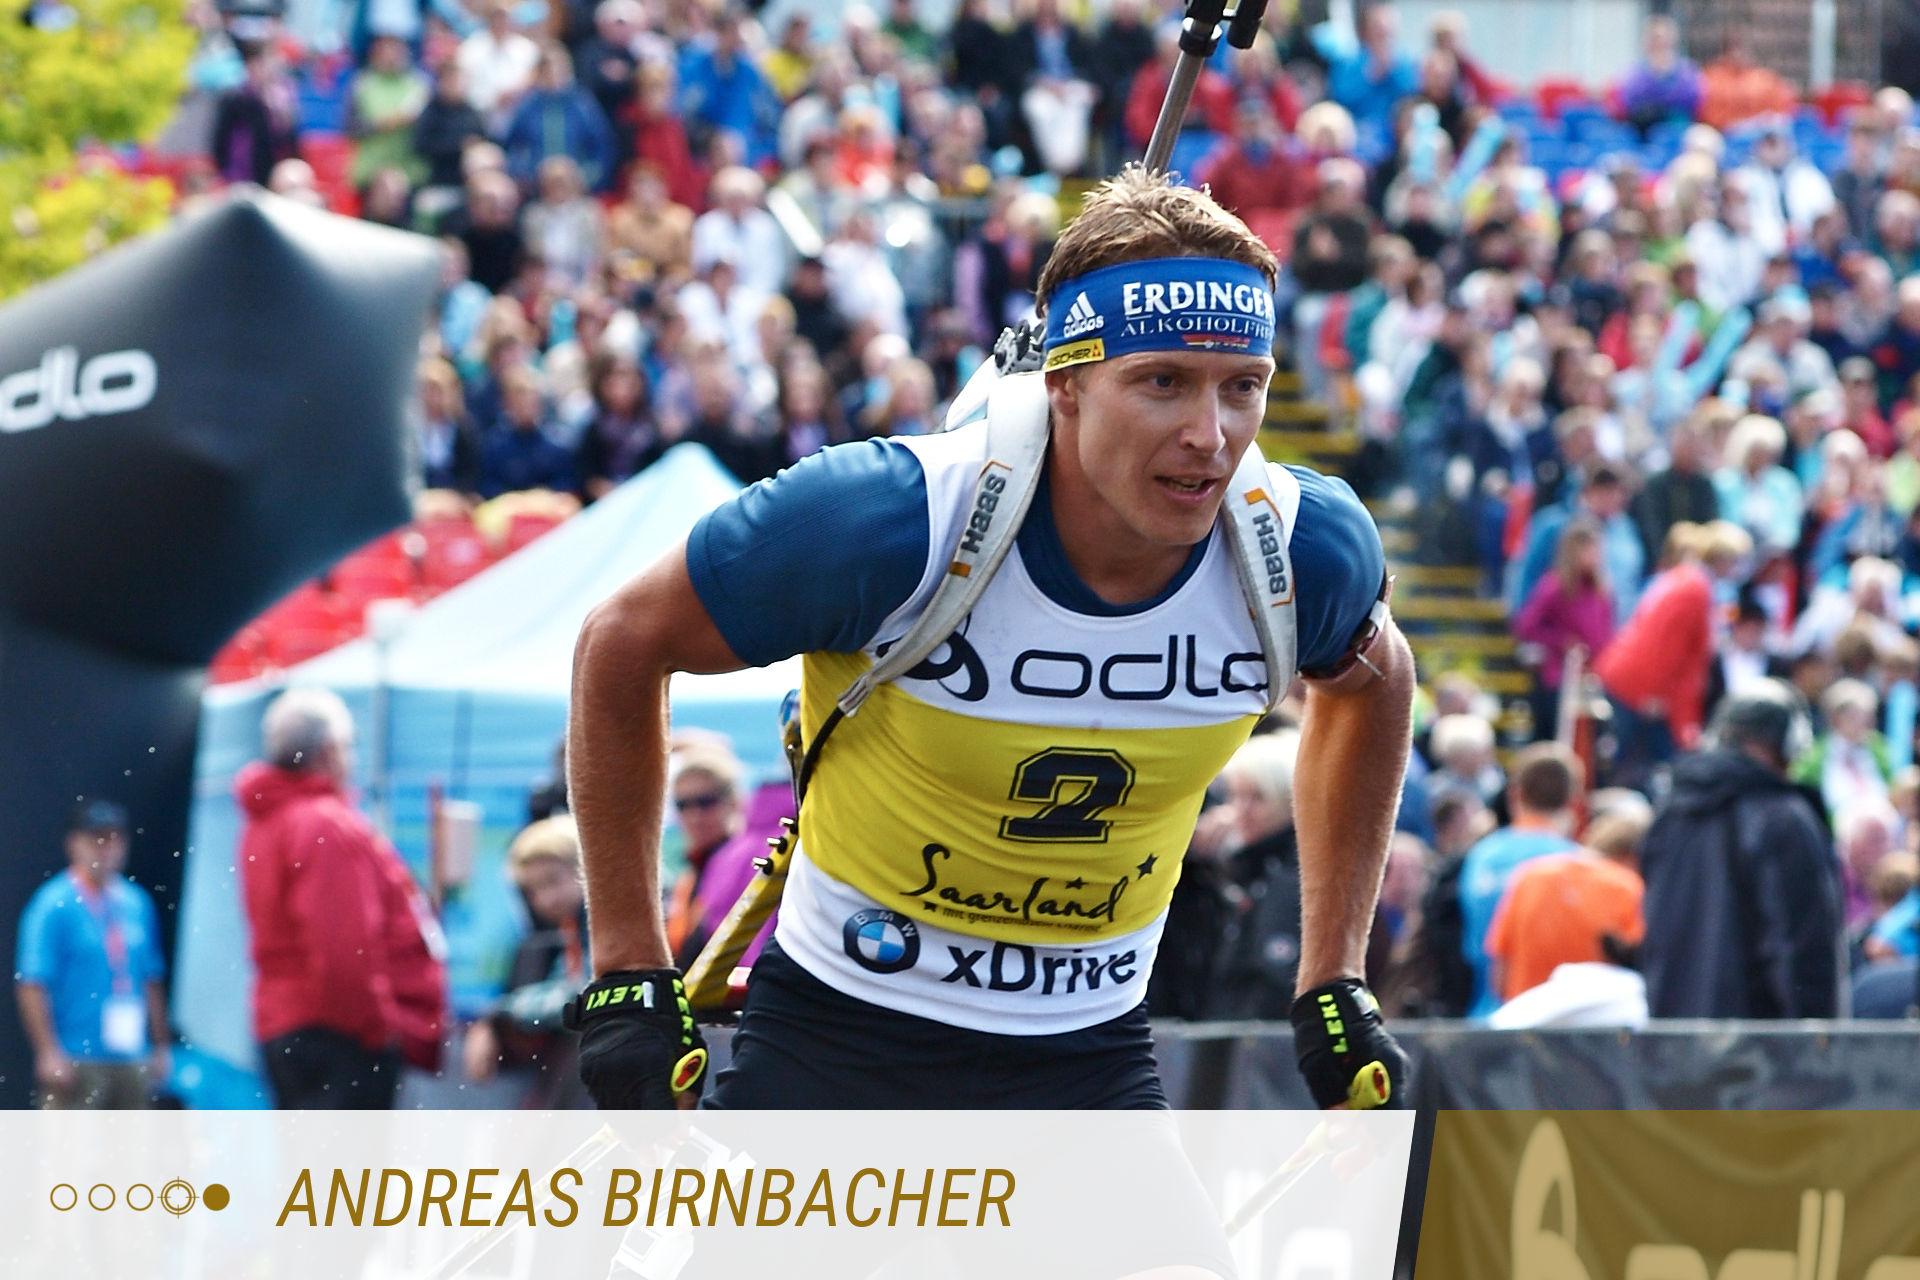 Athleten_Historie_AndreasBirnbacher